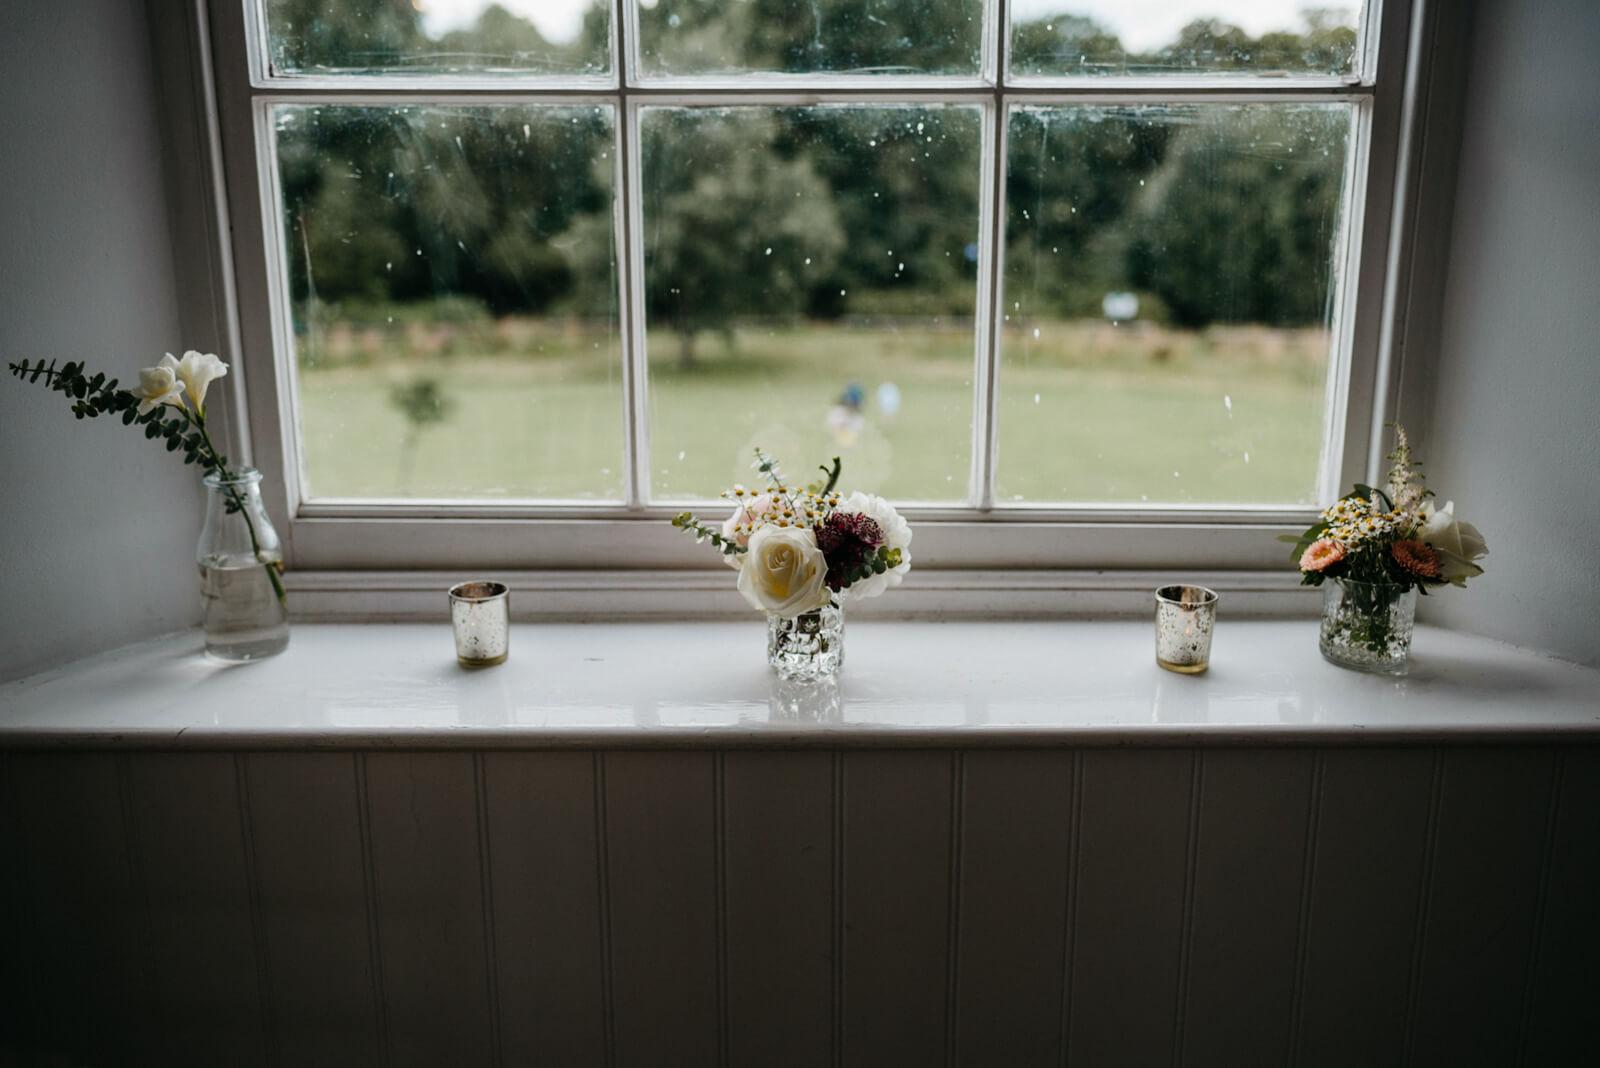 floral arrangements on window ledge looking onto Belair Park